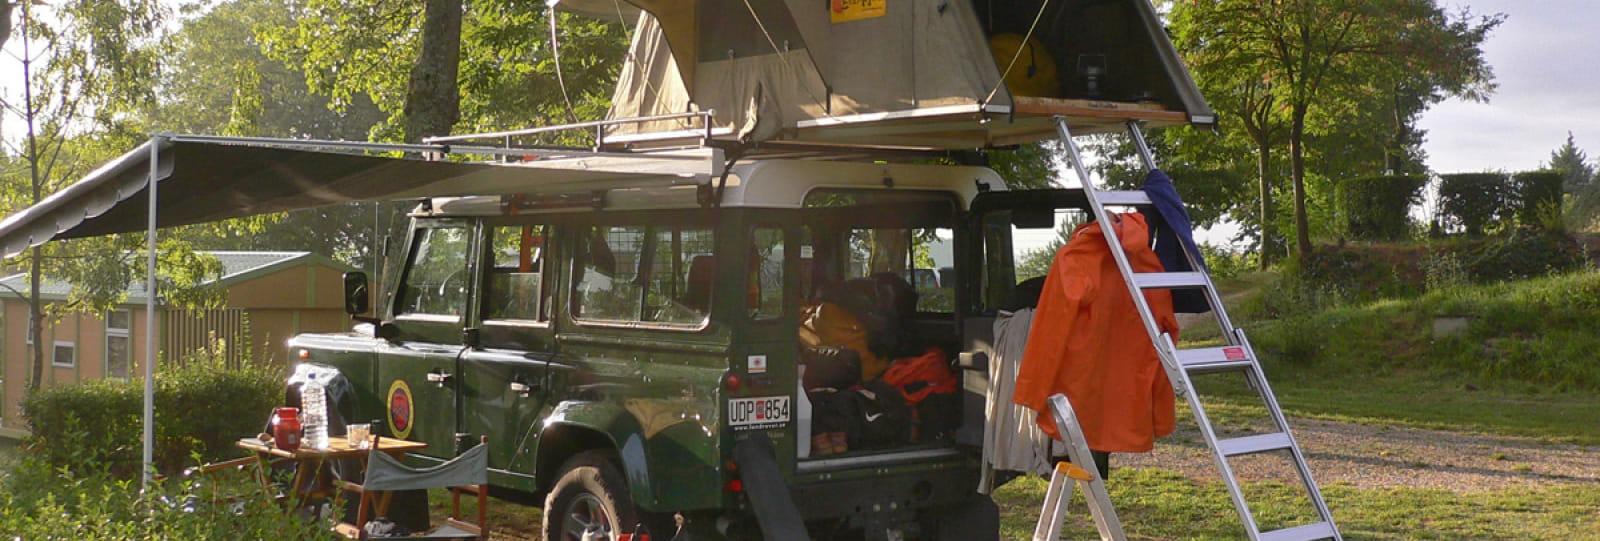 Aire de service/accueil camping-car au camping 'Iserand Calme et Nature'